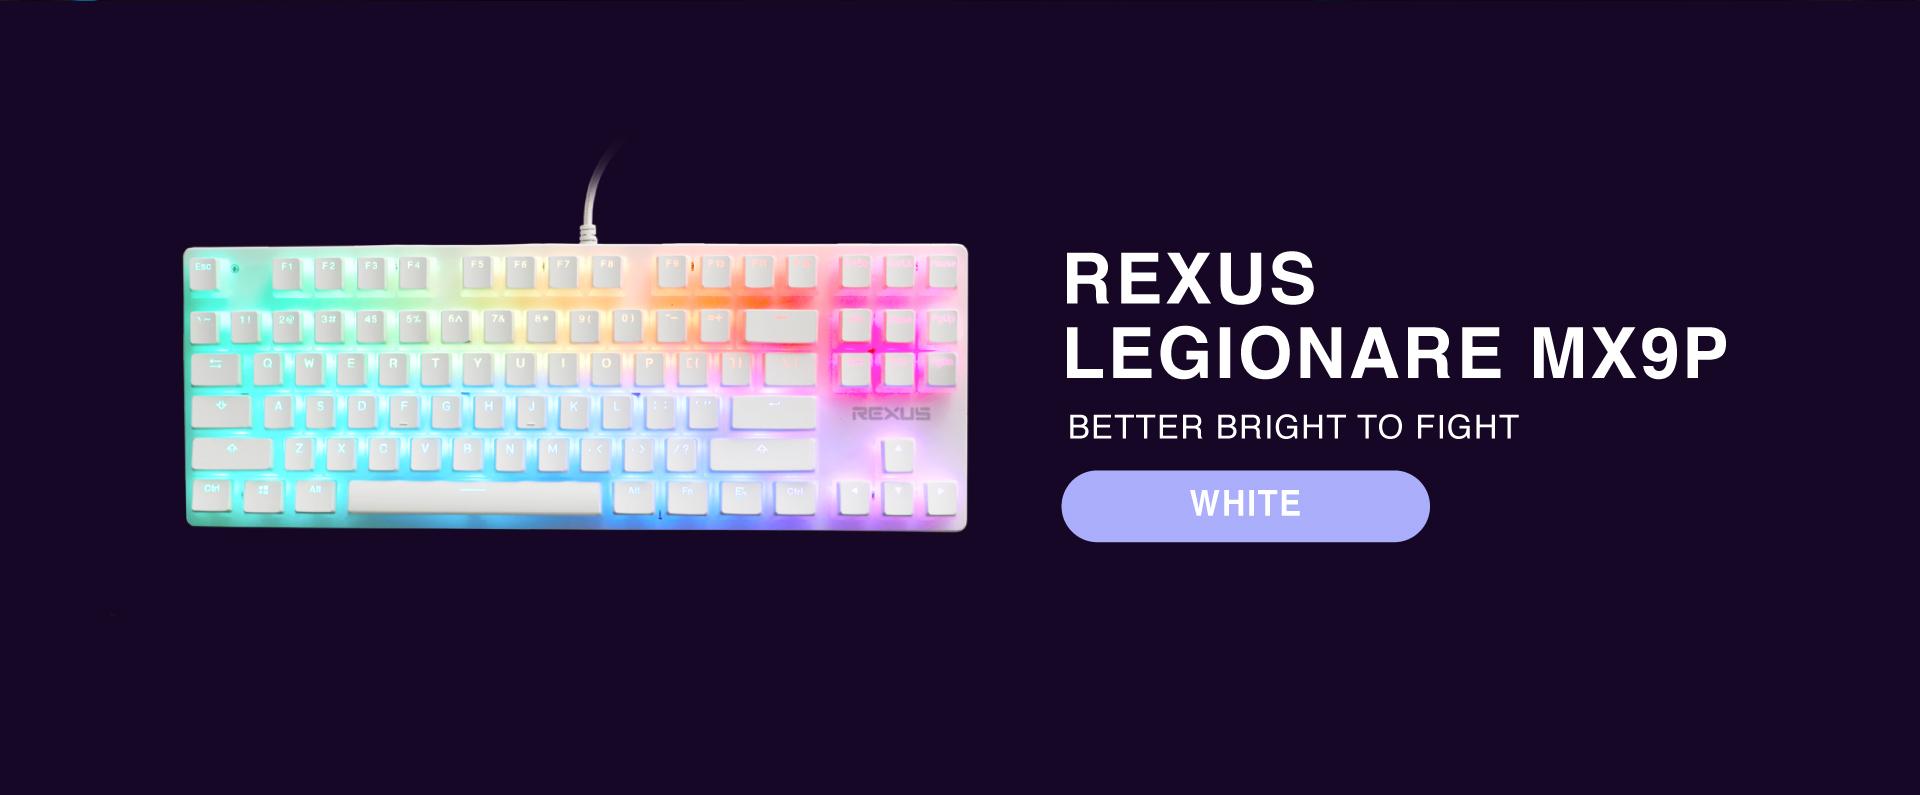 keyboard Rexus Legionare MX9P 2 1